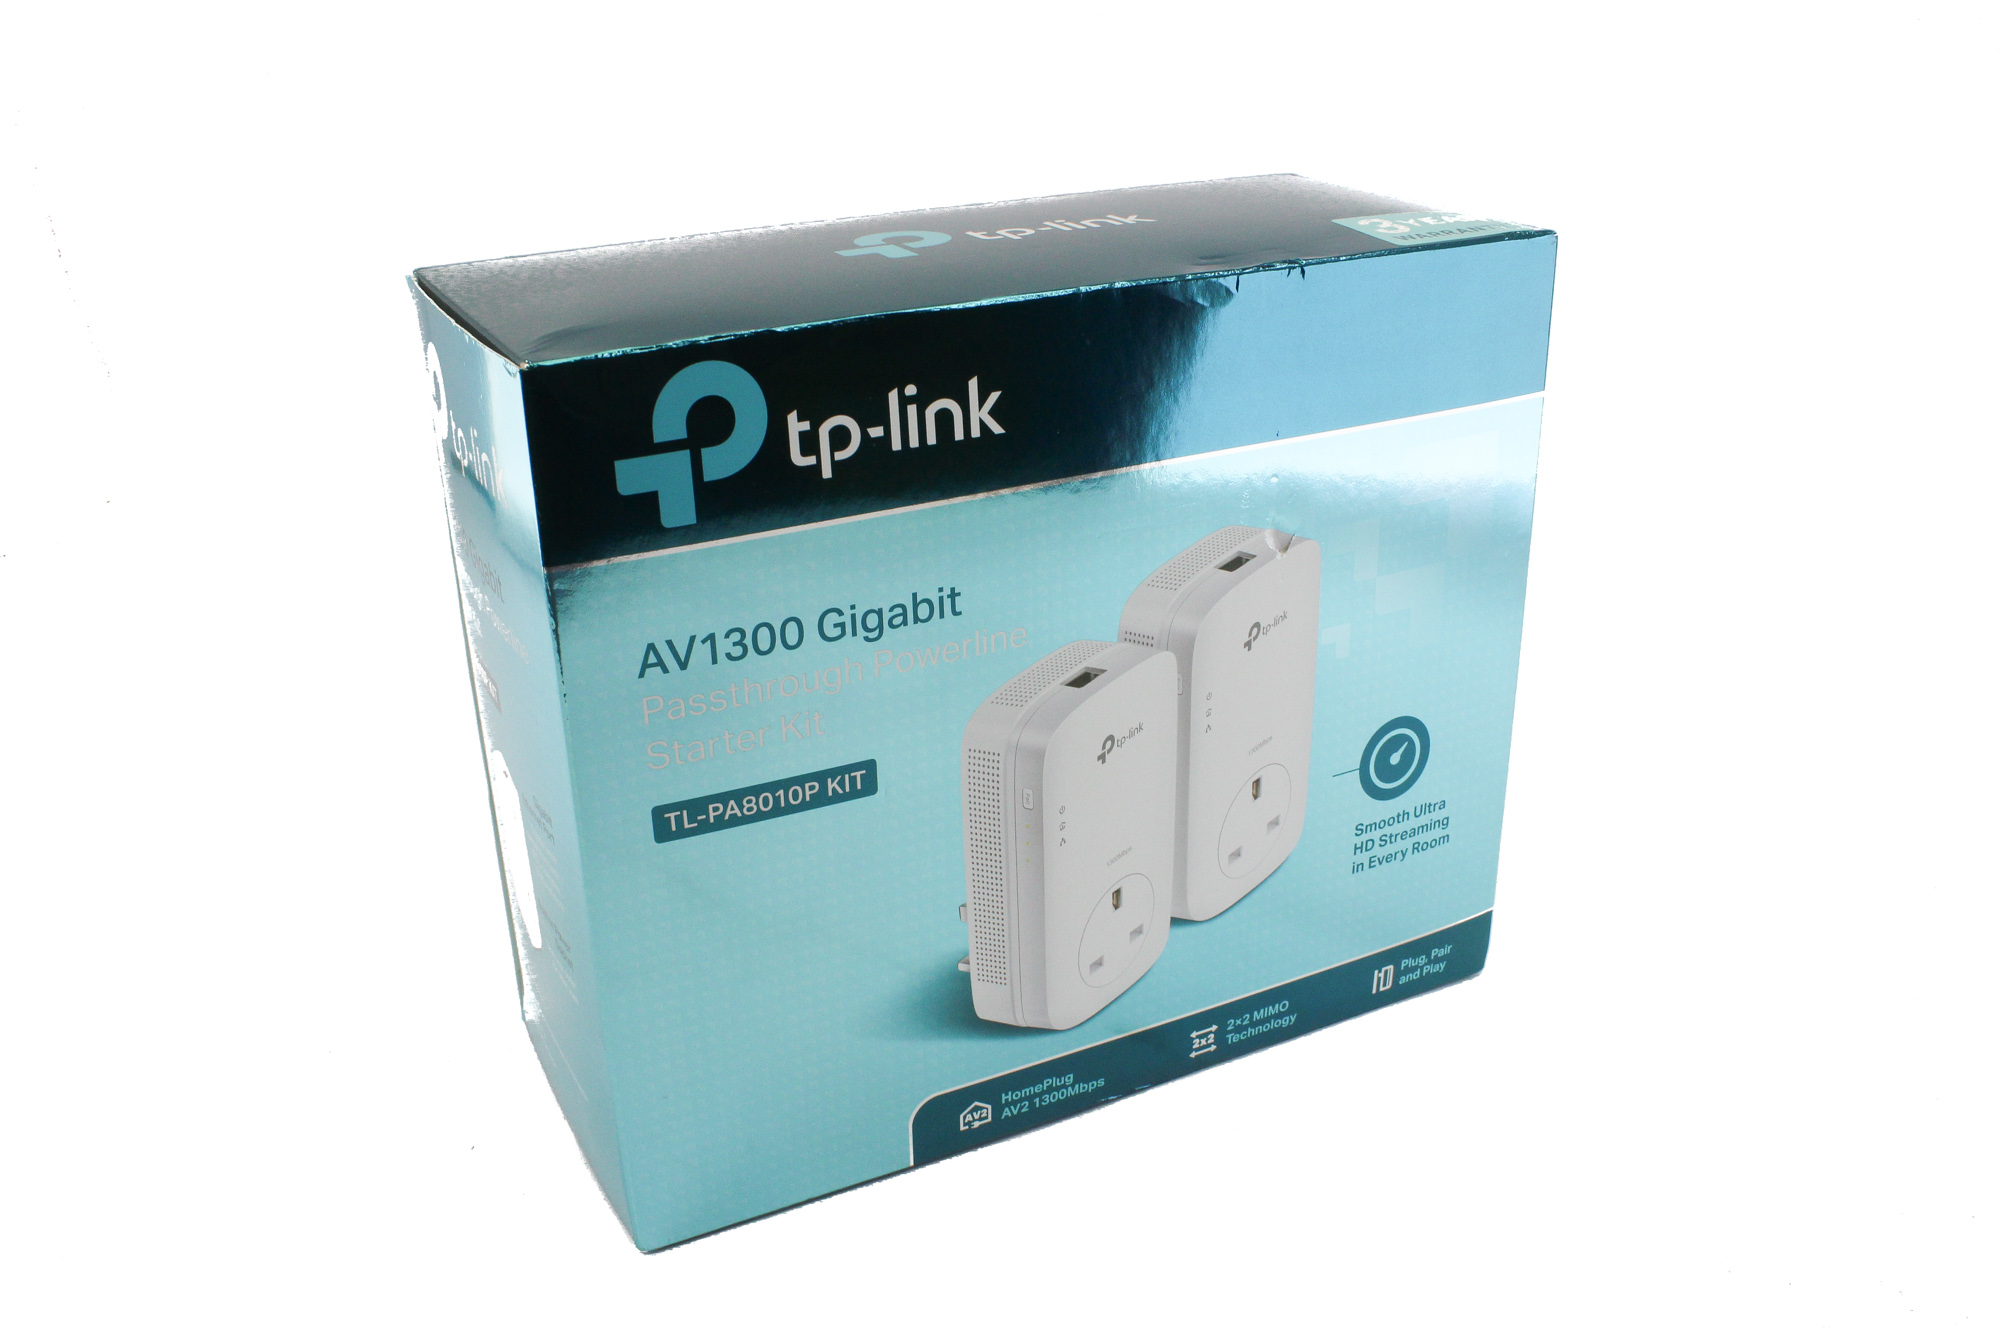 TP-LINK (TL-PA8033P KIT) AV1300 GB Powerline Adapter Kit, 3-Port, AC Pass Through